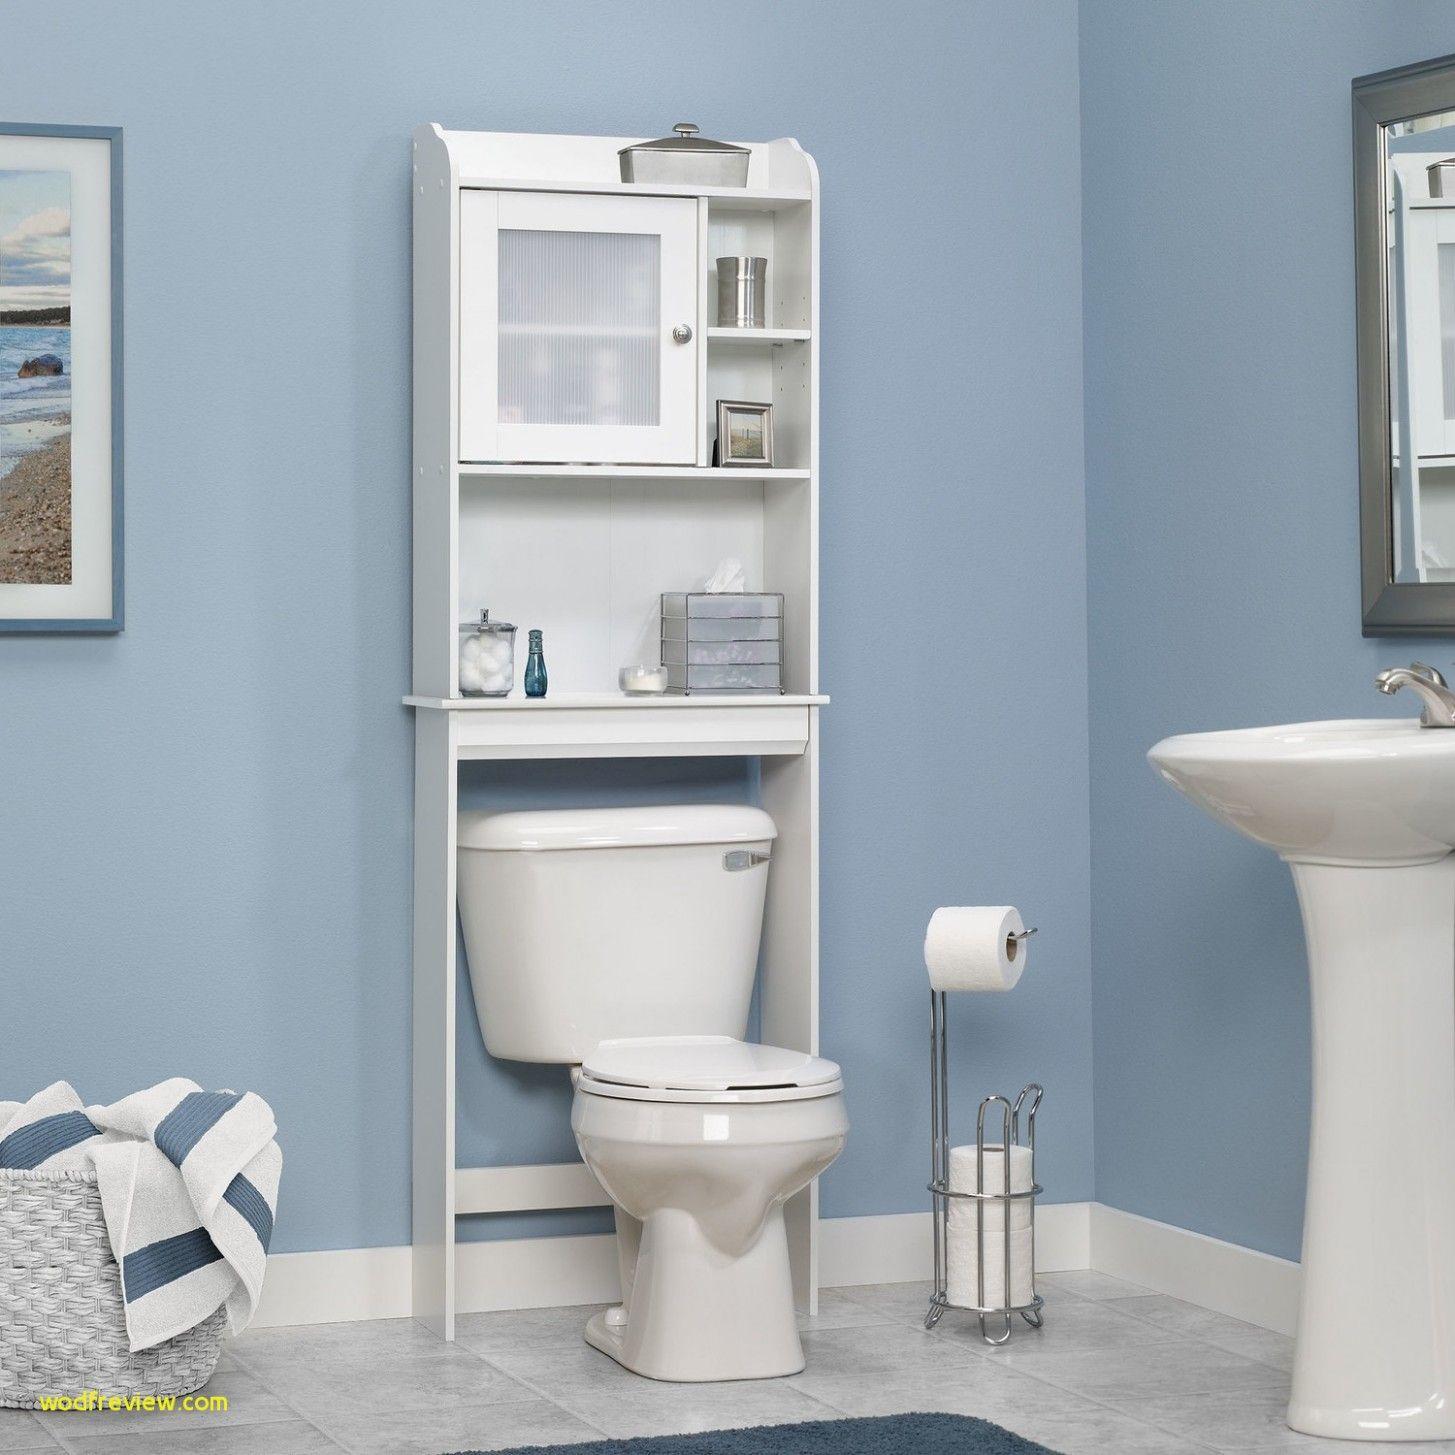 Philippines Small Bathroom Design Lemari Kamar Mandi Toilet